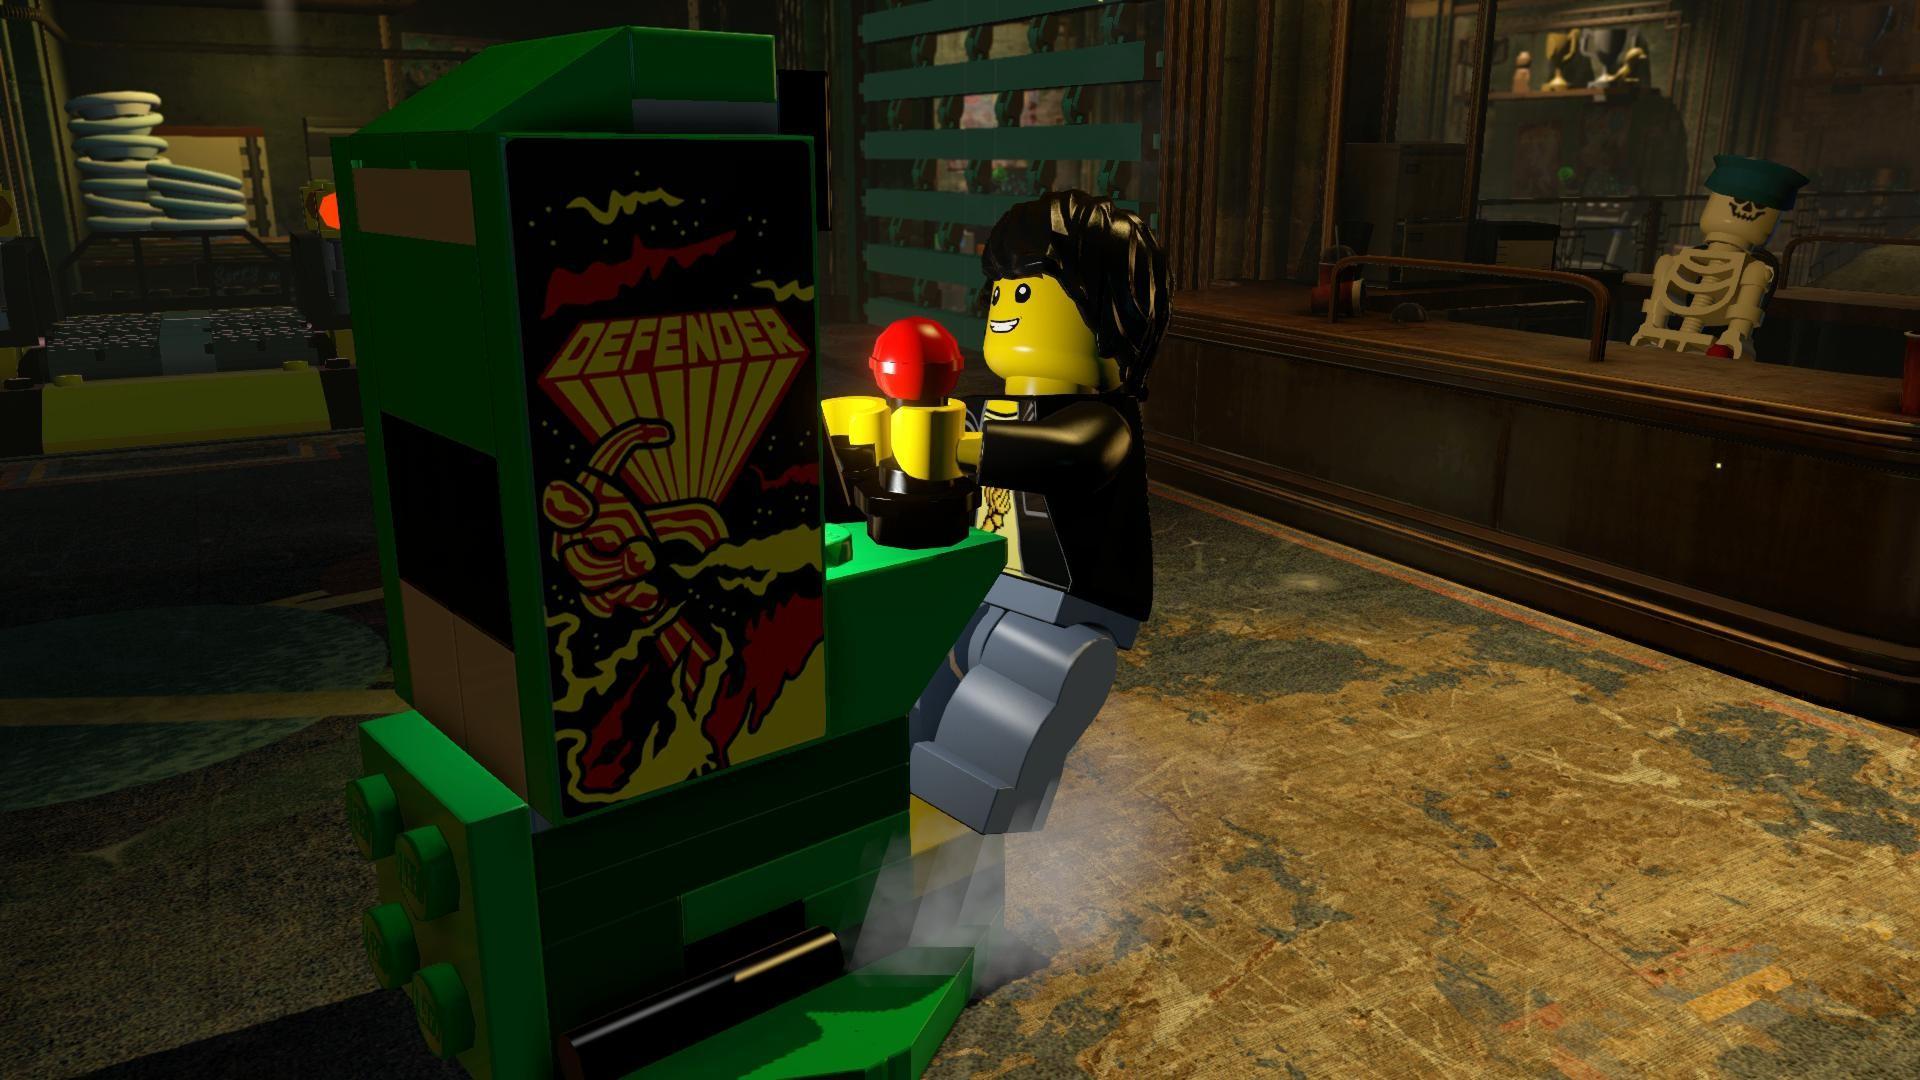 LEGO_Dimensions_Gamer_Kid_3_bmp_jpgcopy